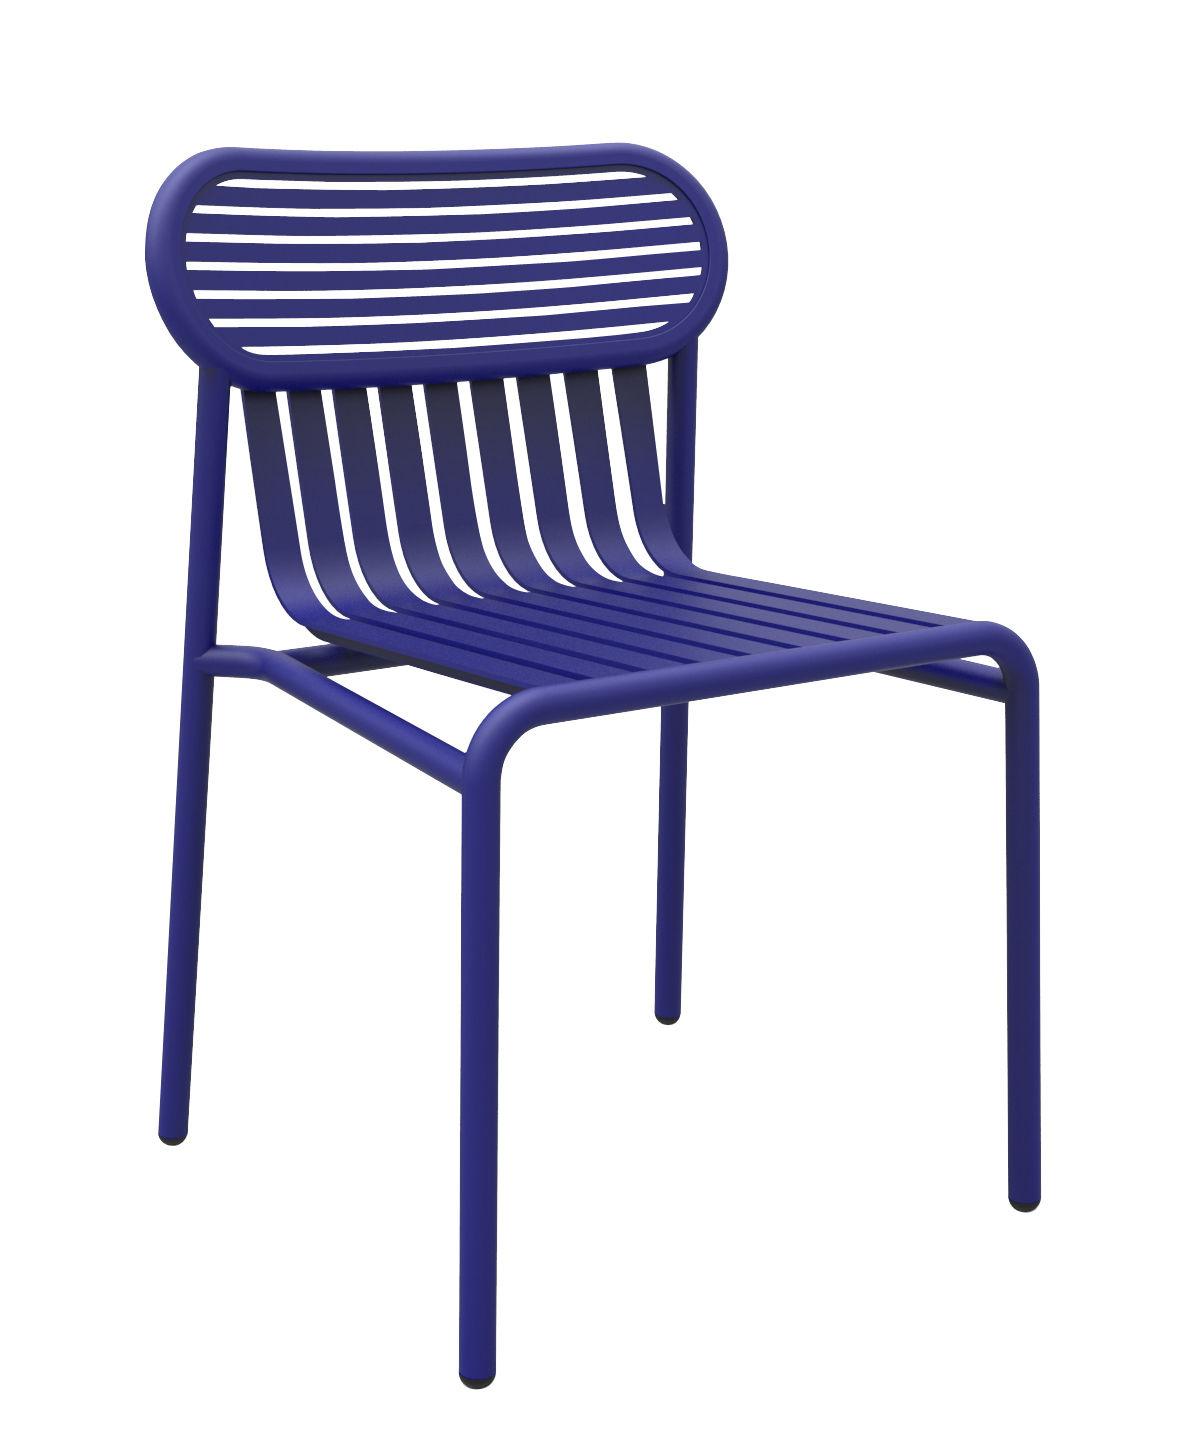 Möbel - Stühle  - Week-end Stuhl / Aluminium - Petite Friture - Blau - Aluminium, thermolackiert und expoxidbeschichtet